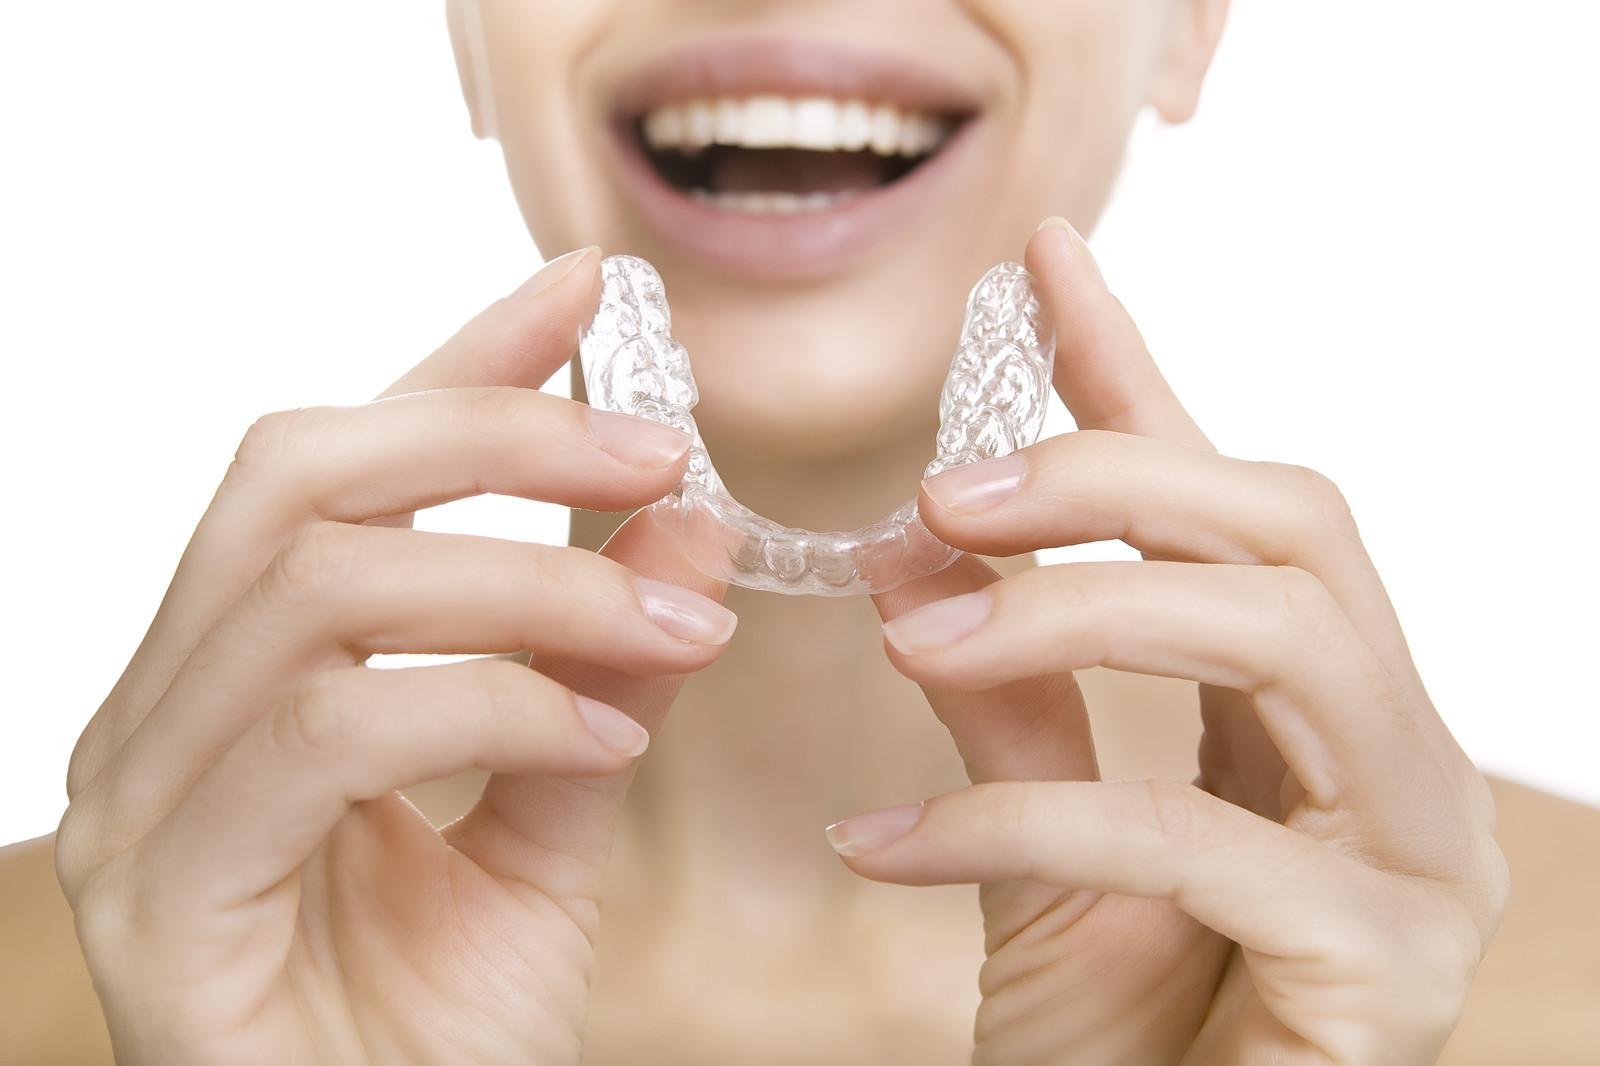 Ortodoncia invisible en Córdoba - Clínica Dental PCM